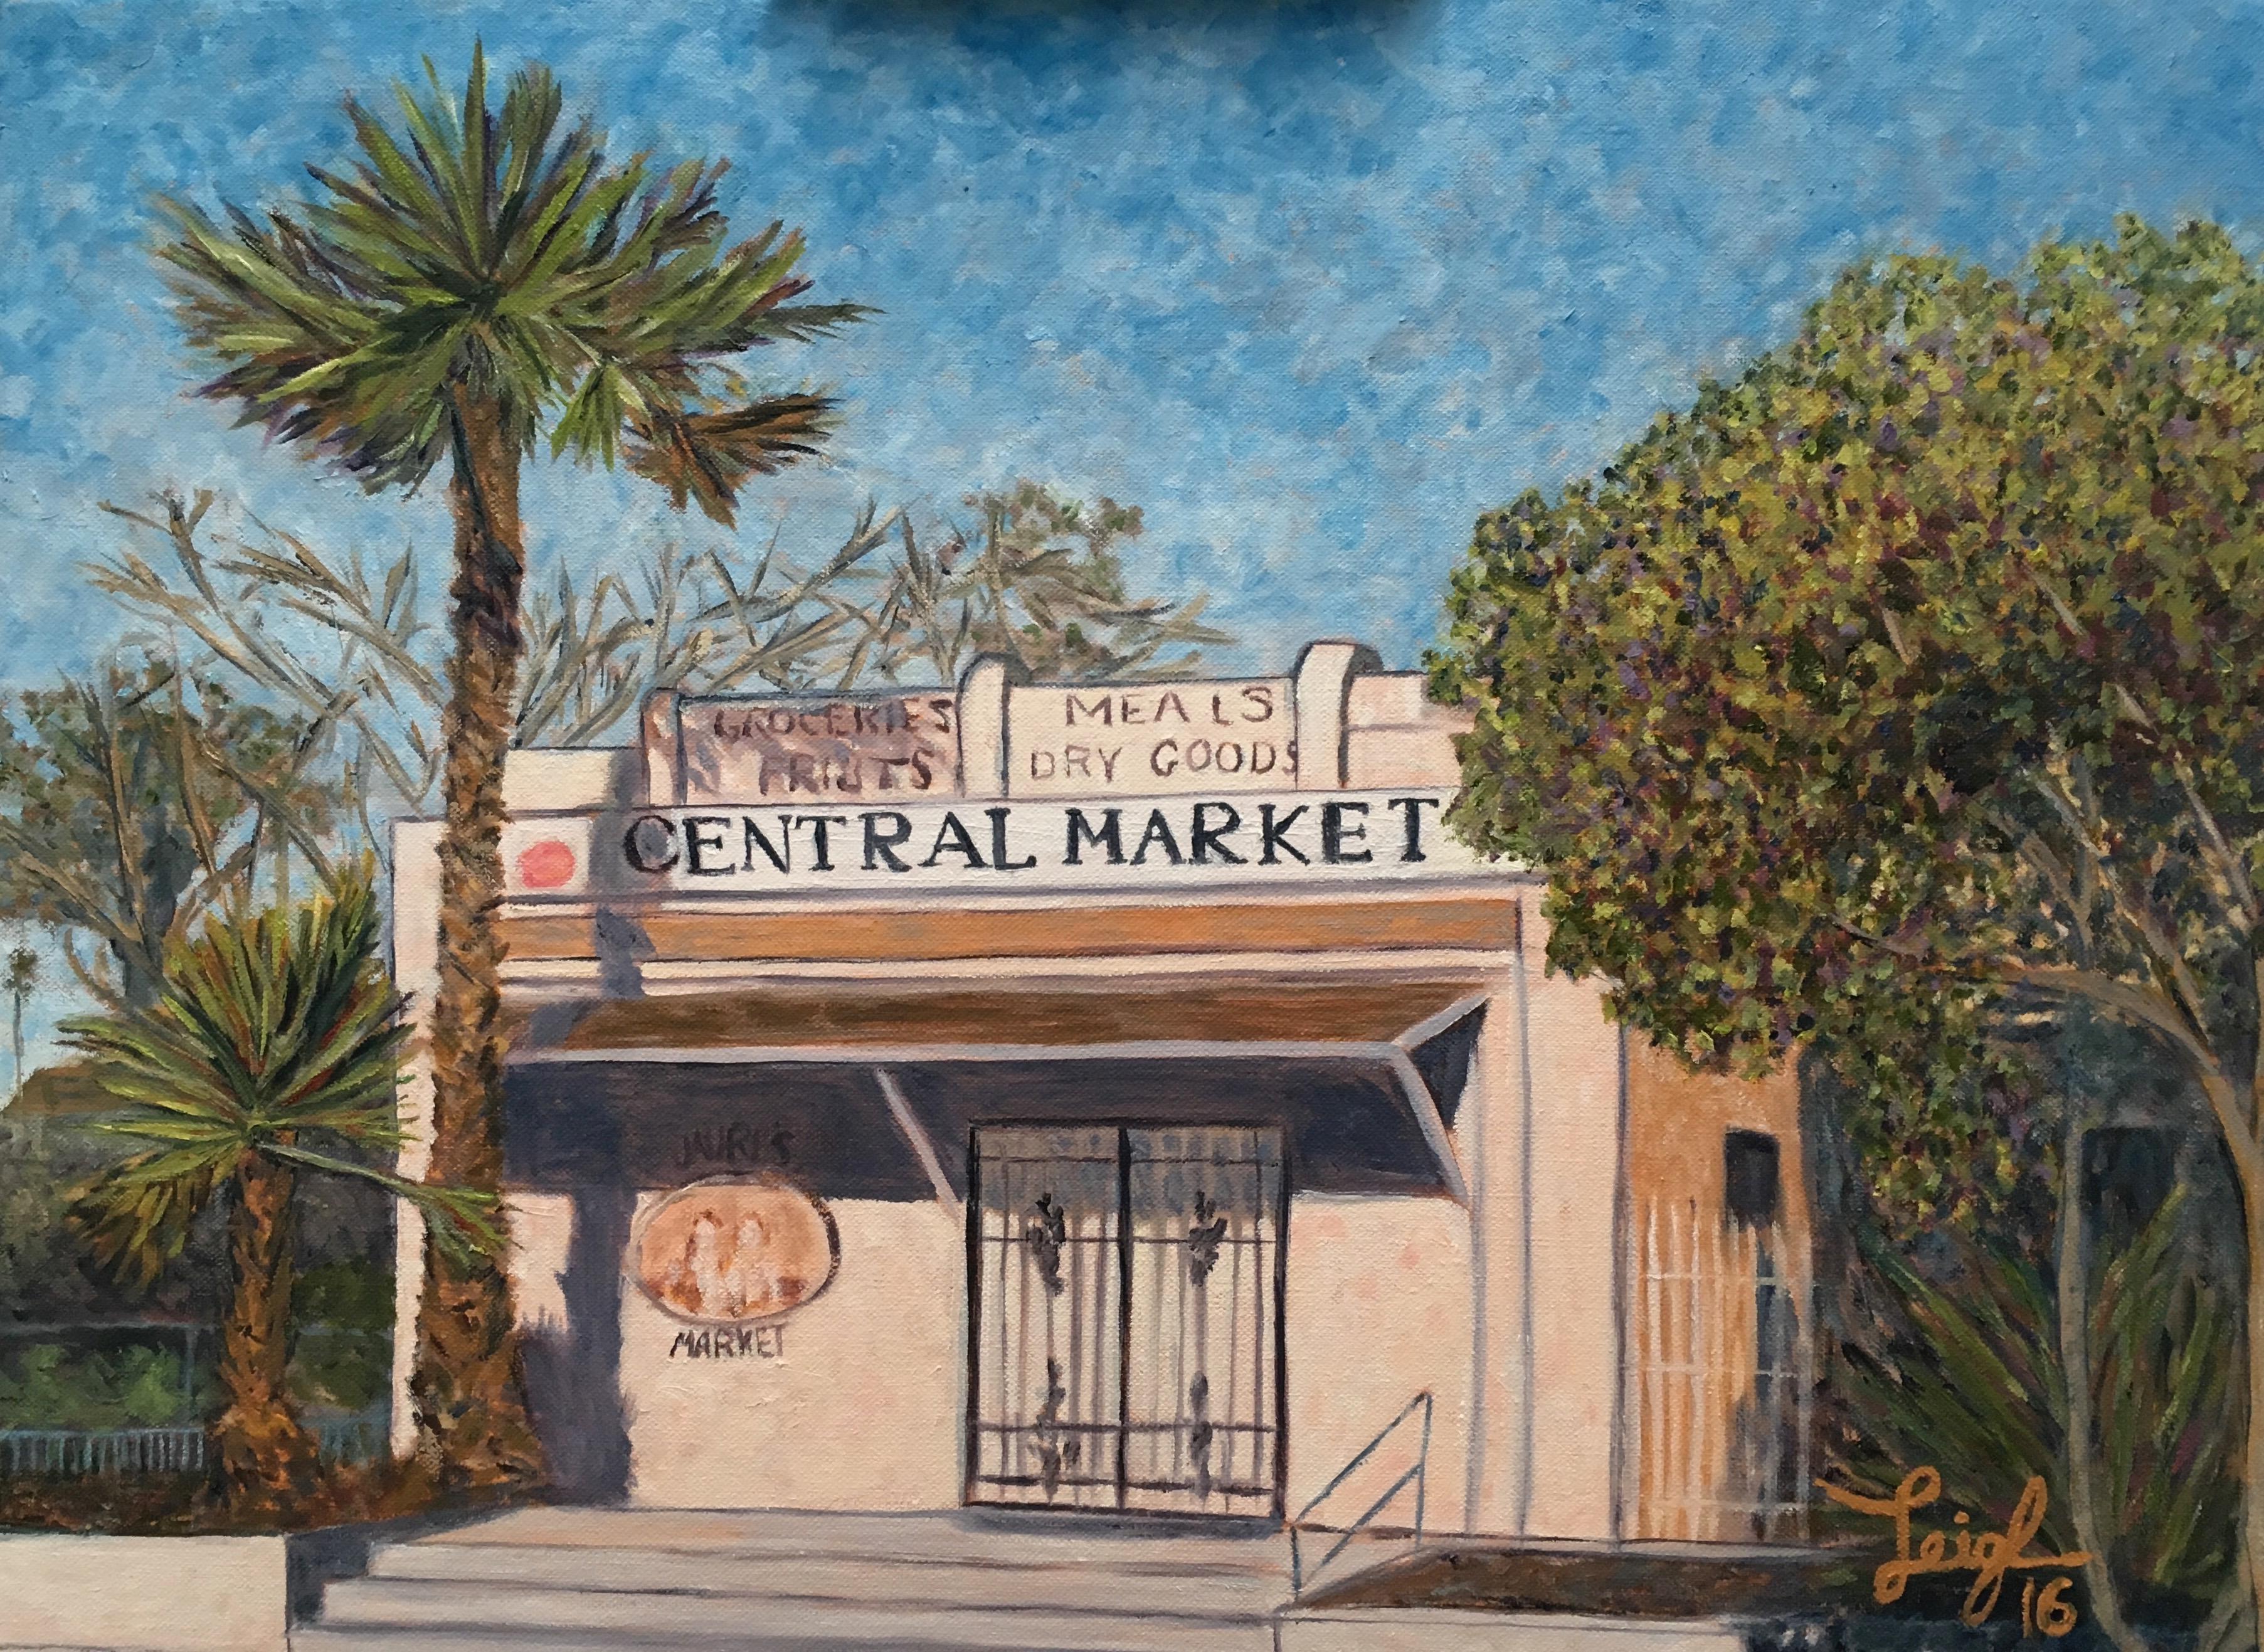 Central Market  ~   Leo Pacheco, Carlsbad, CA 2016  •  20  x 16